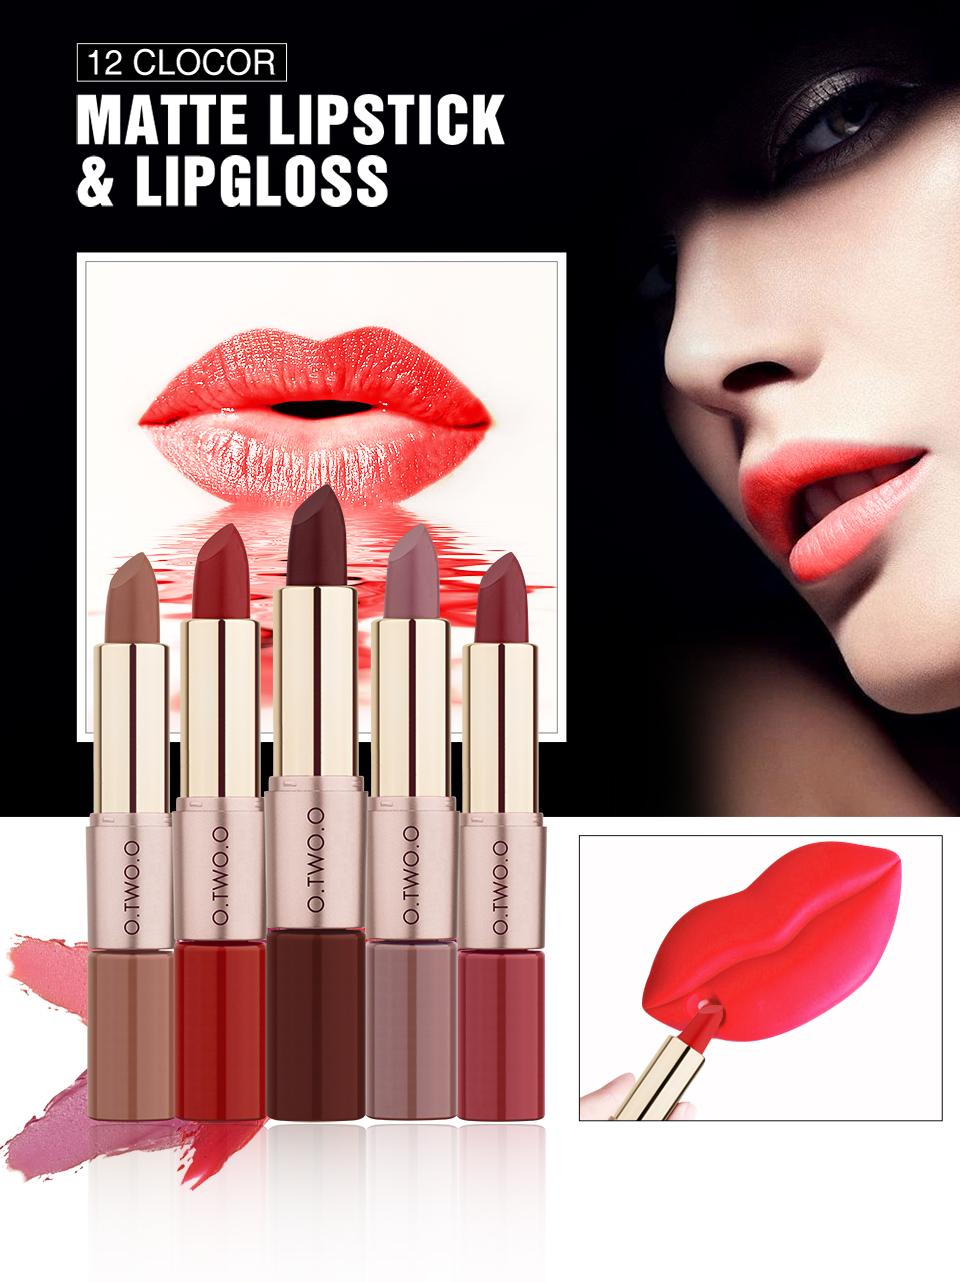 12 colors Matte Lipstick & Lipgloss